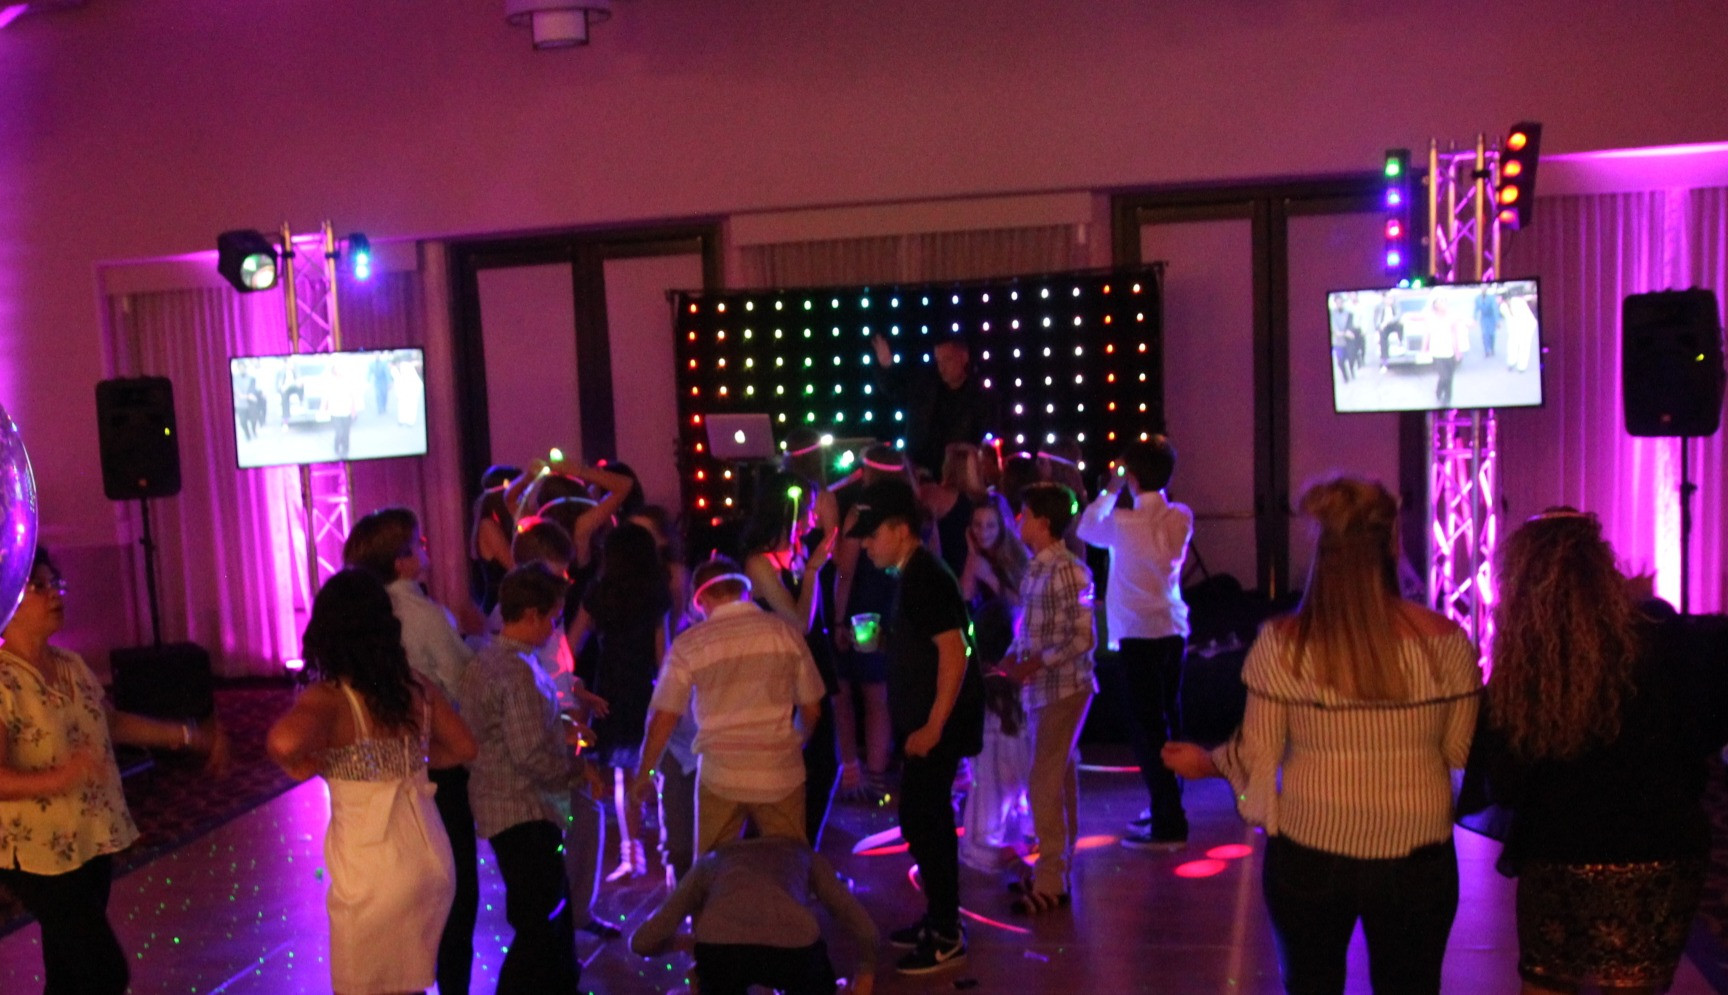 Video_Dance_Party_2Screens.jpg